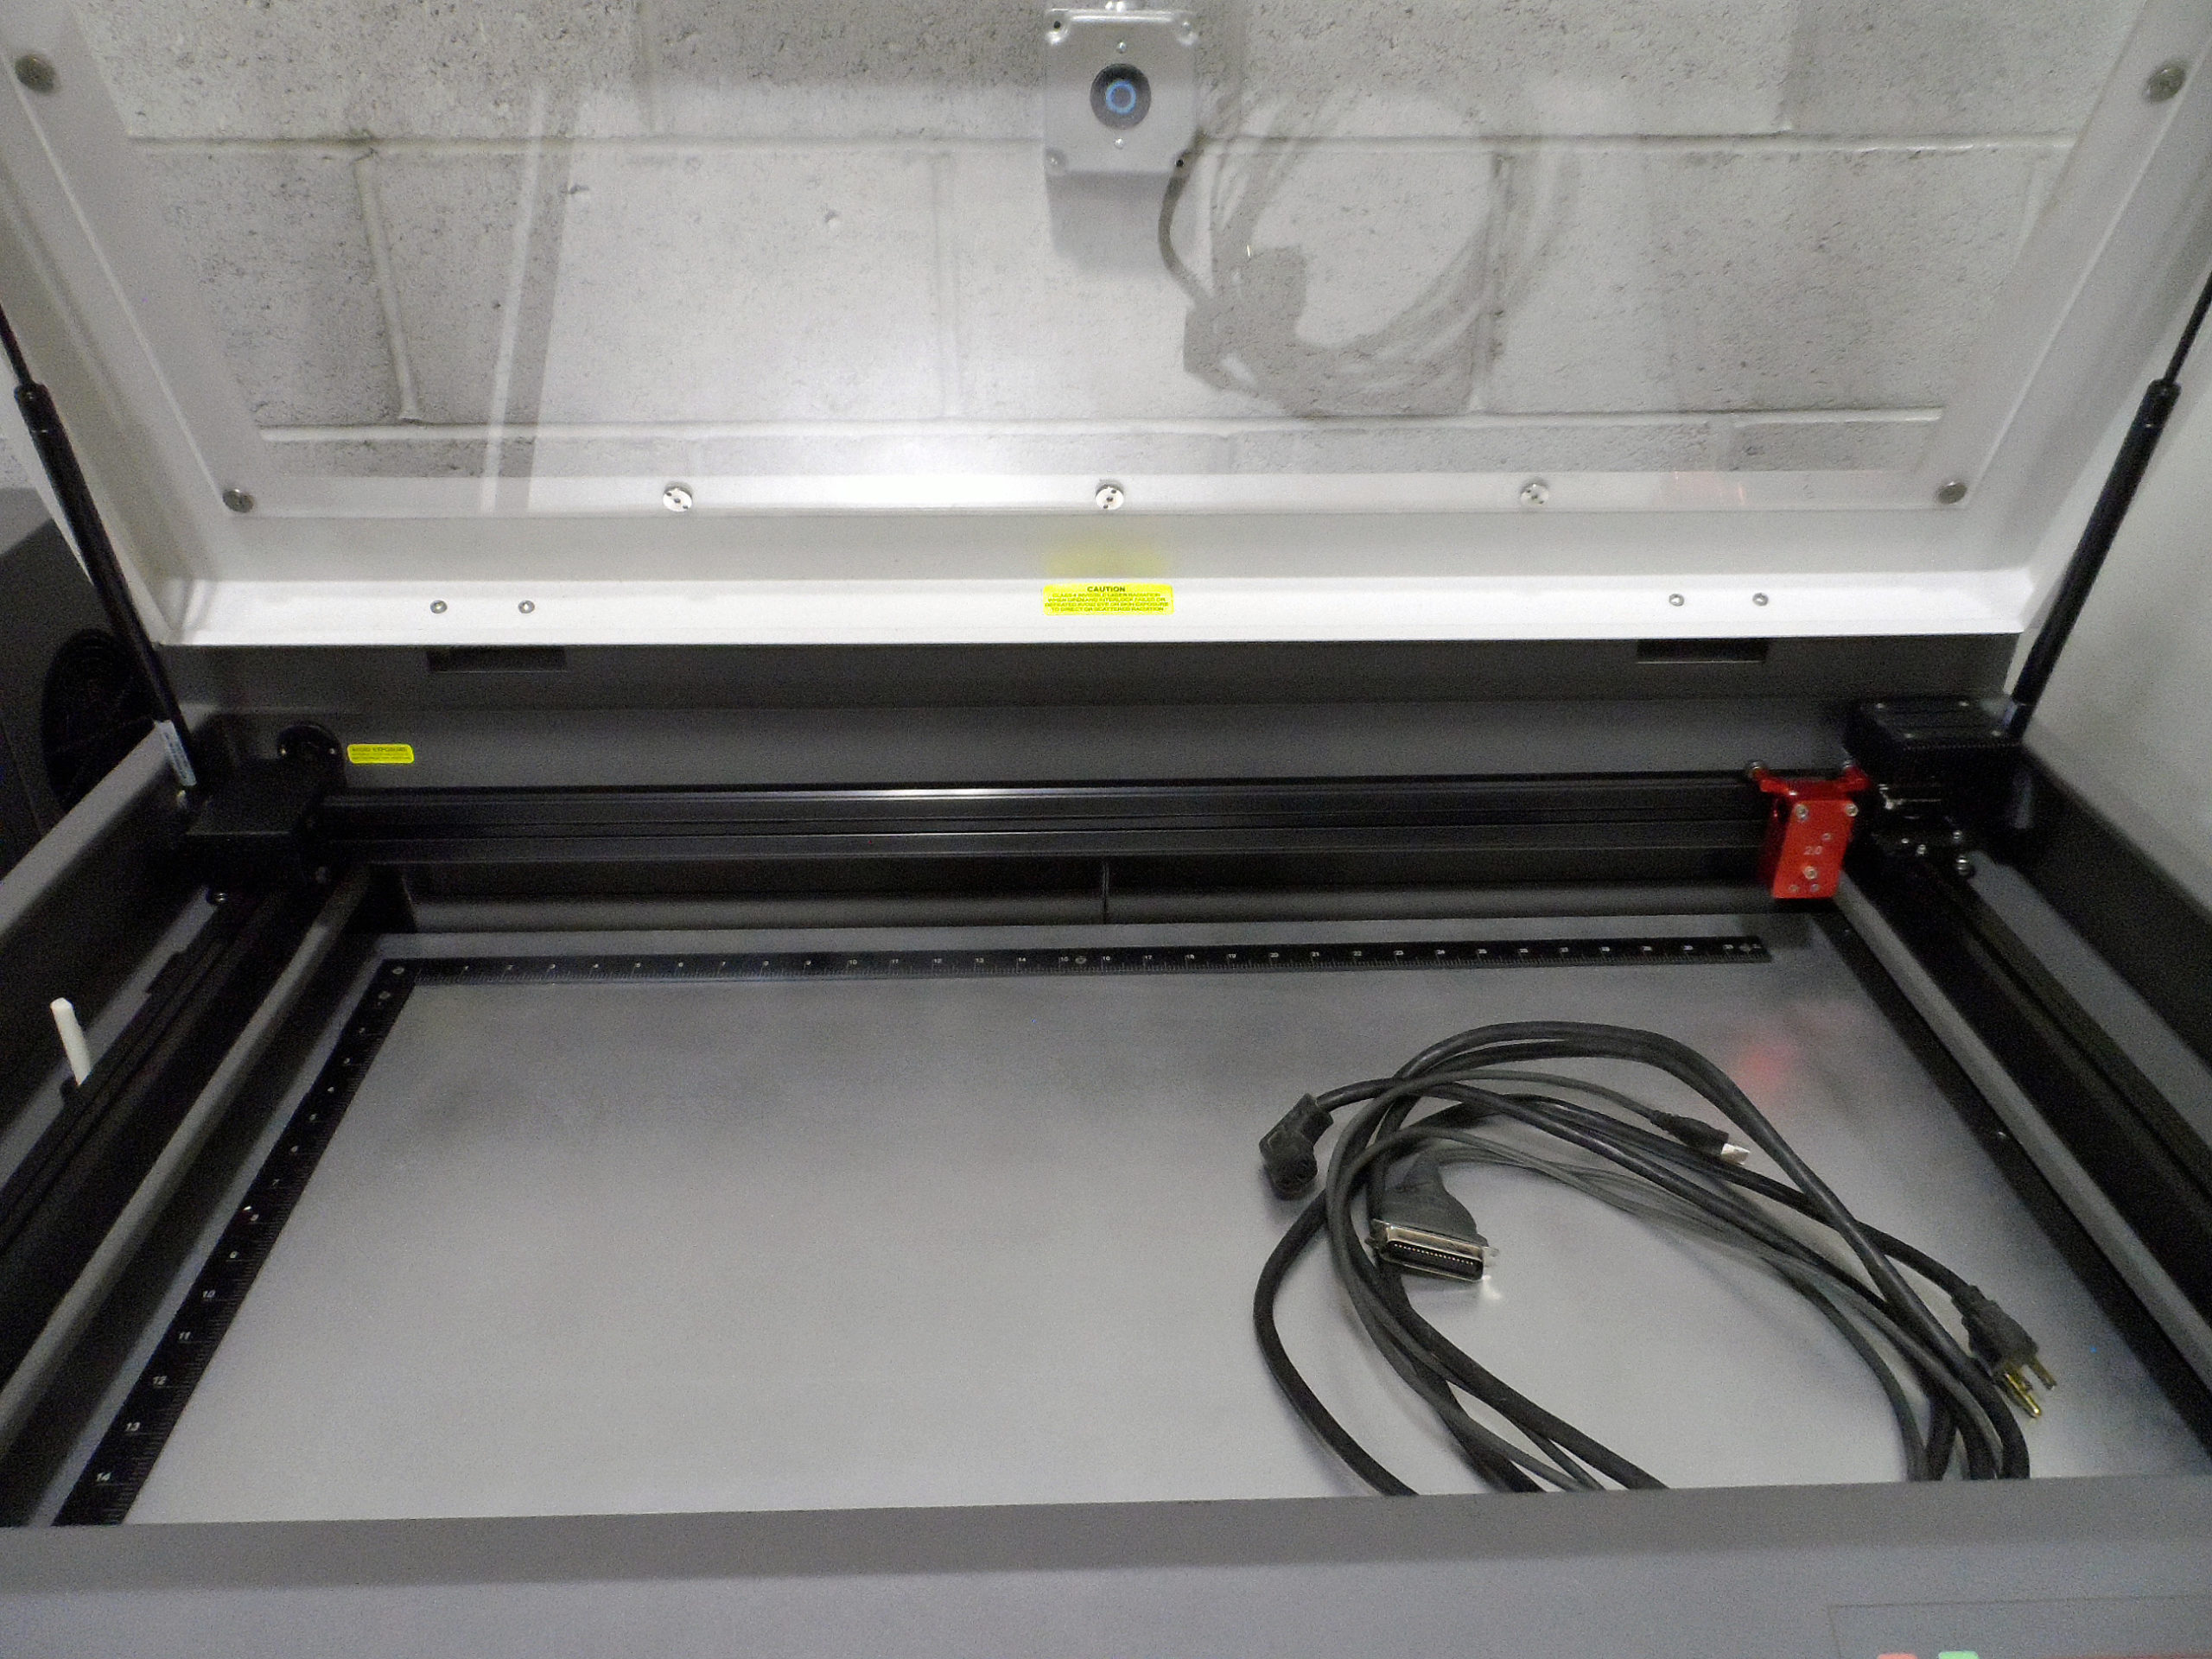 Refurbished X-660 45-watt or 25-watt Inside